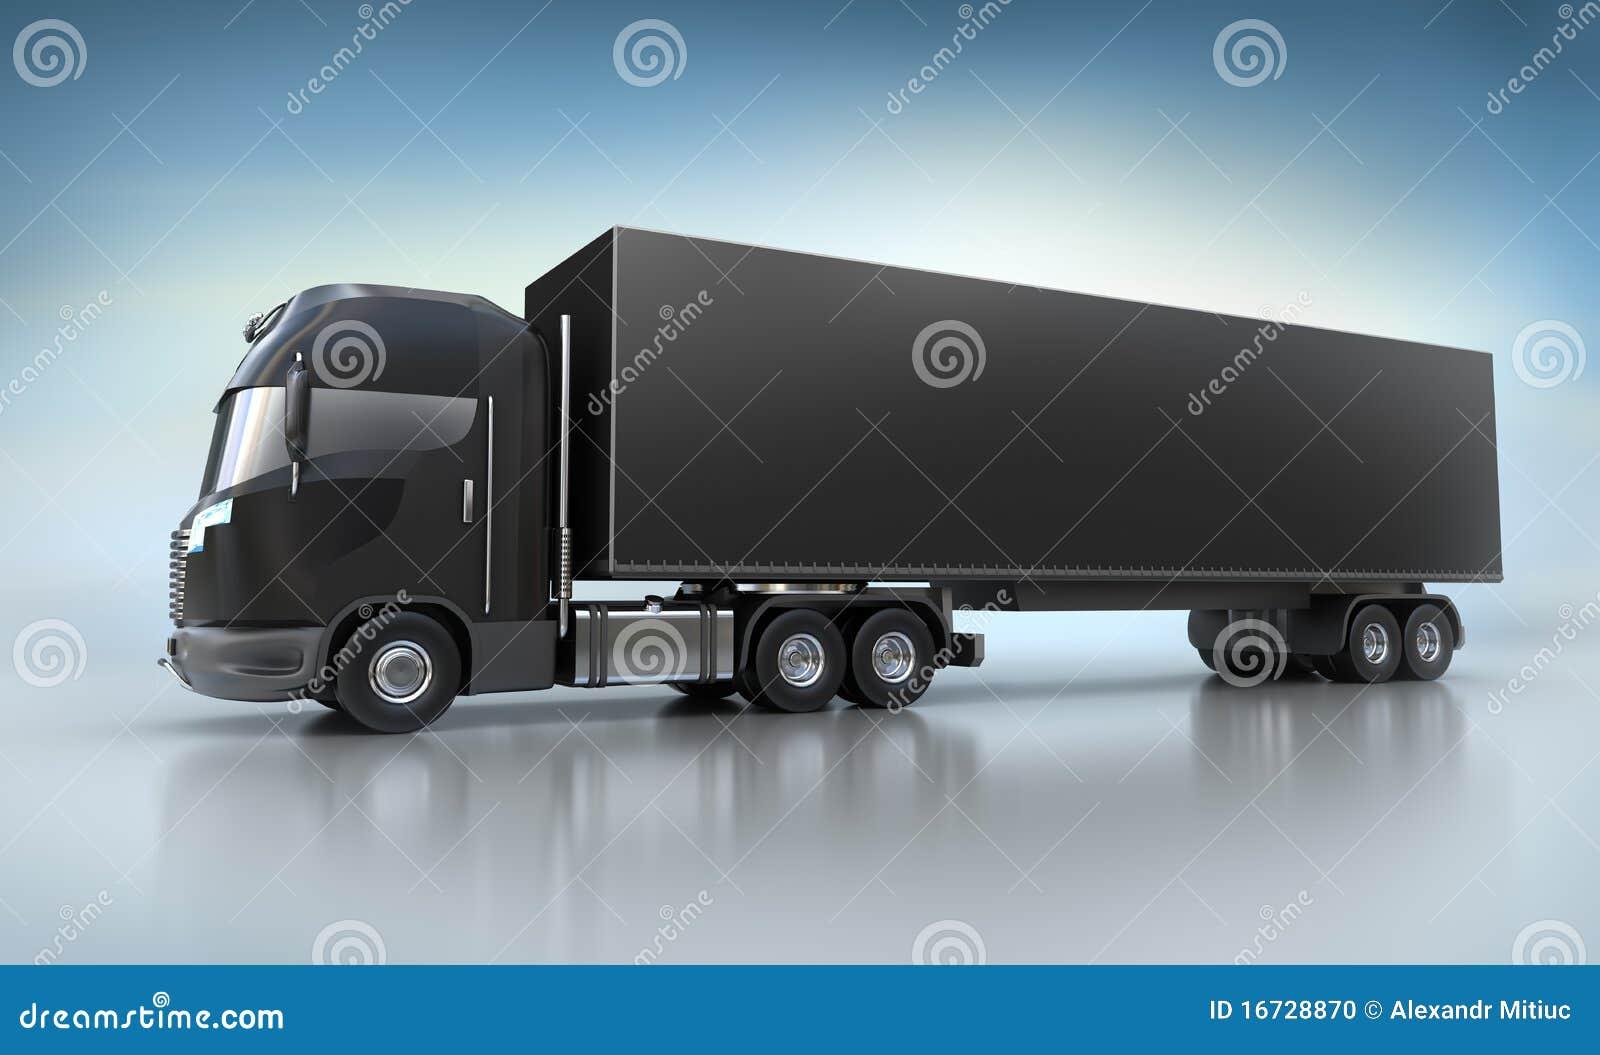 Semi Truck Seats >> Black Truck Illustration Stock Photo - Image: 16728870